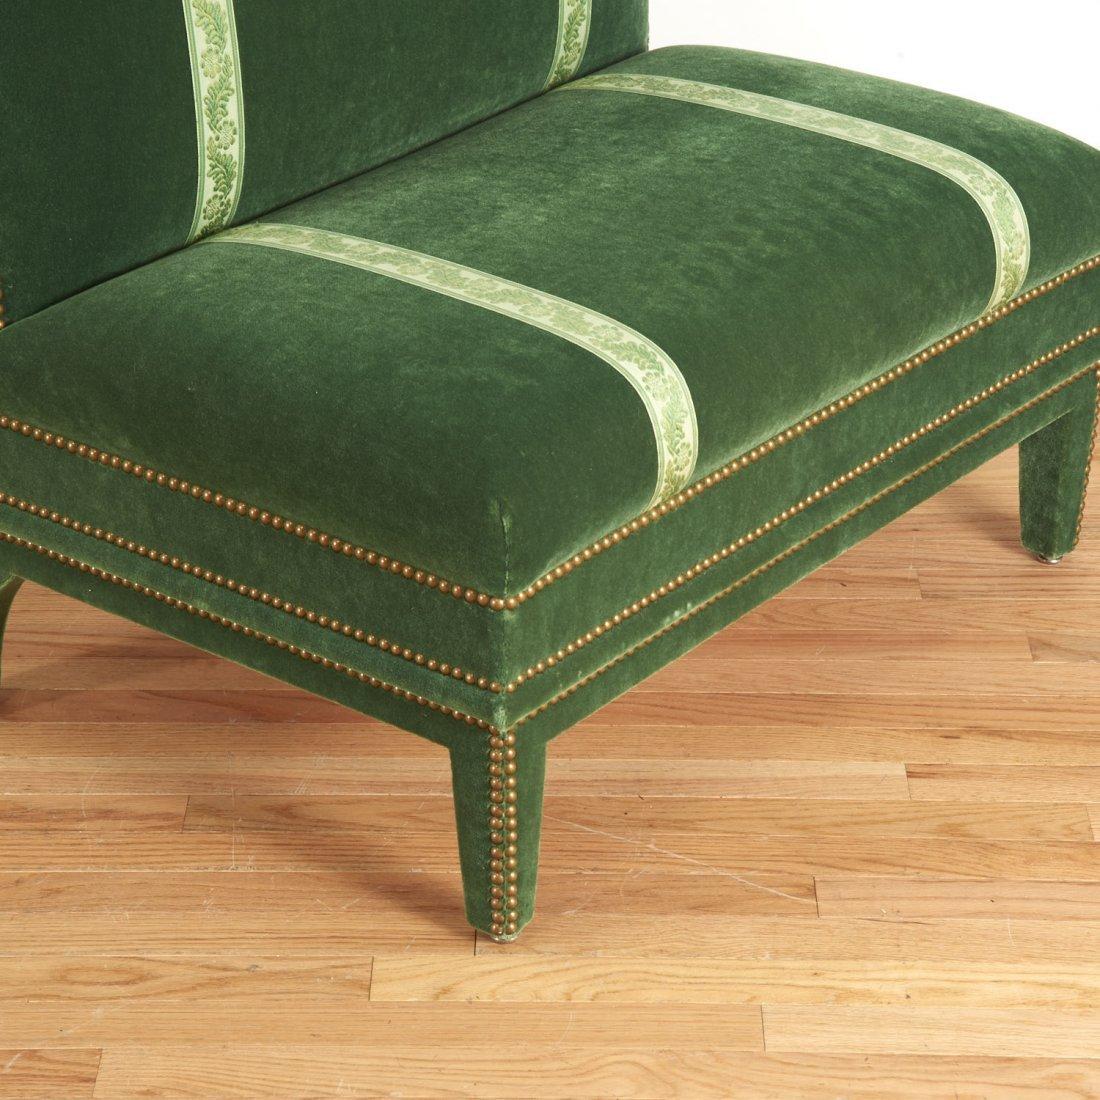 Pair Renzo Mongiardino style closed-nail velvet sofas - 3